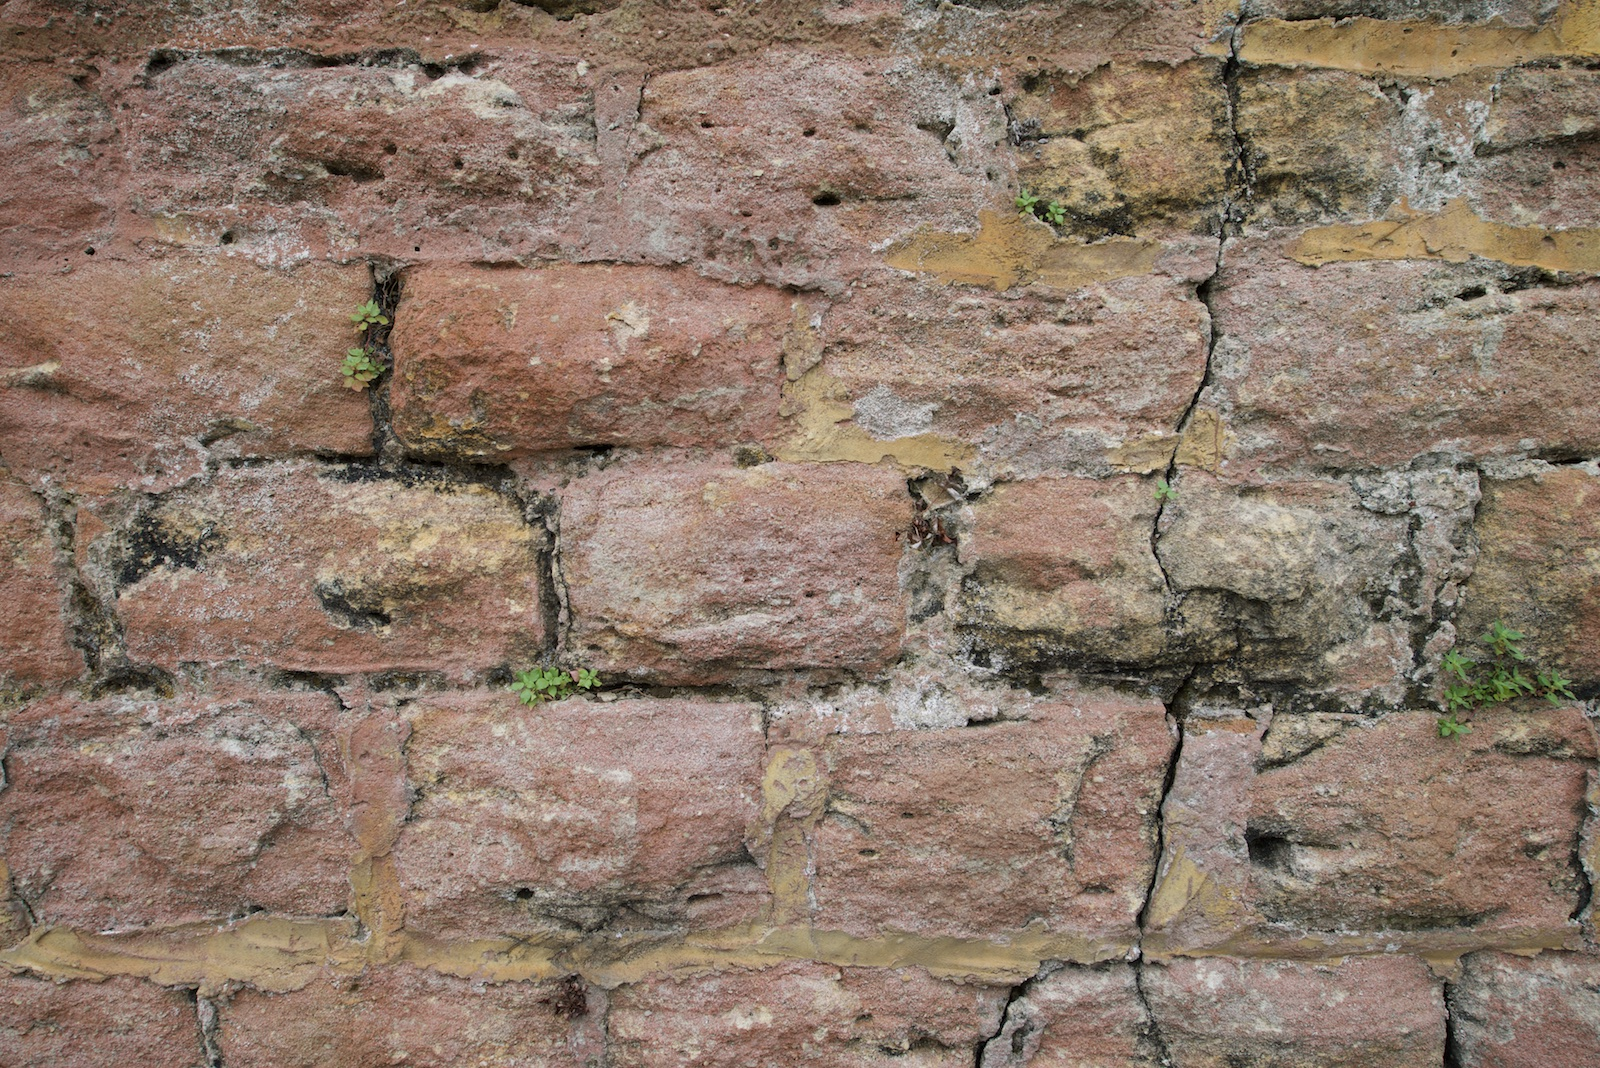 2015-0012-0193. Stone wall, Sydney, Australia.